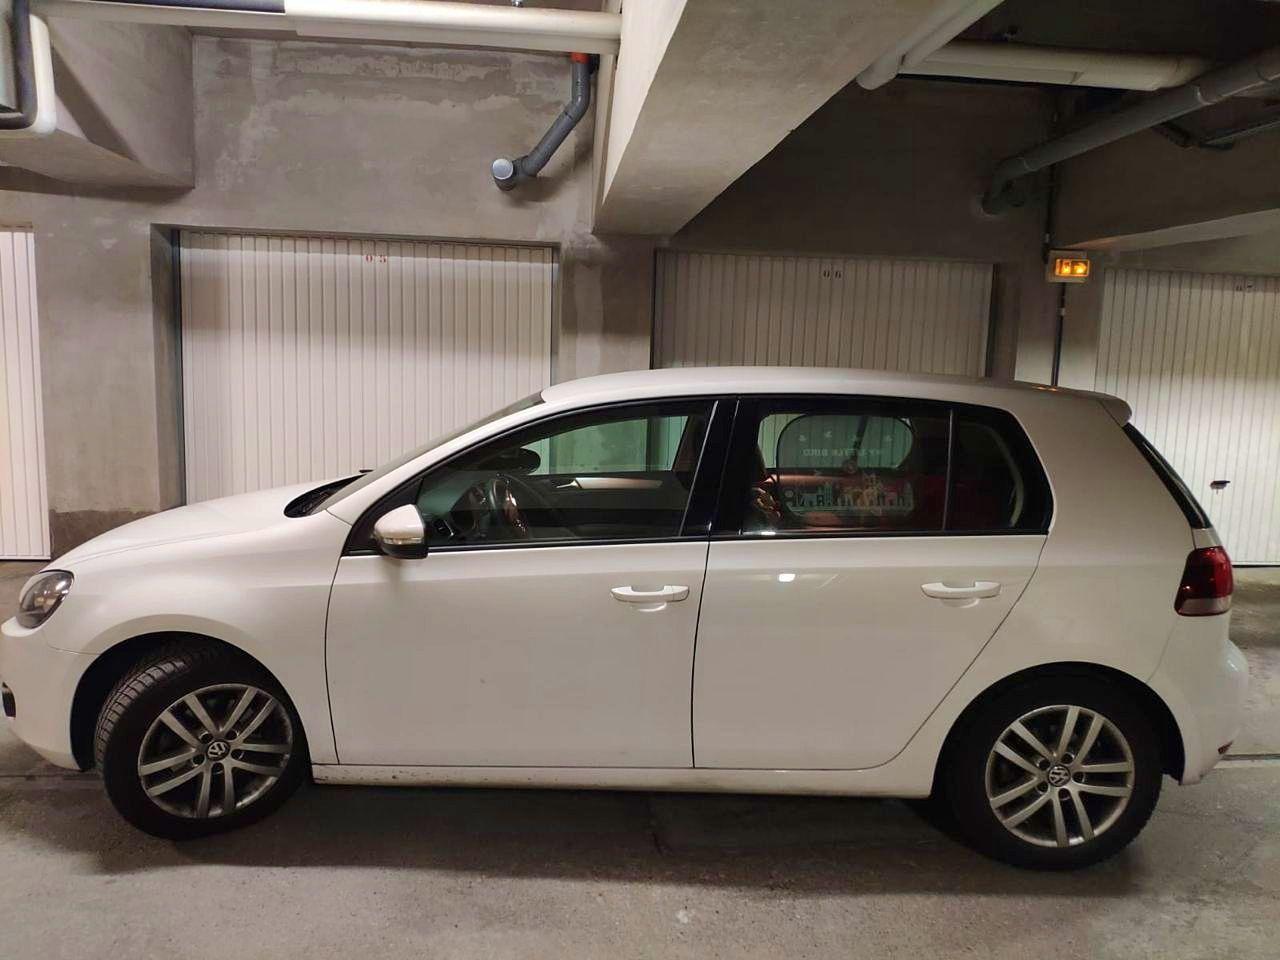 Vends Volkswagen Golf 6, 1.6TDI, fin 2012, 115000km